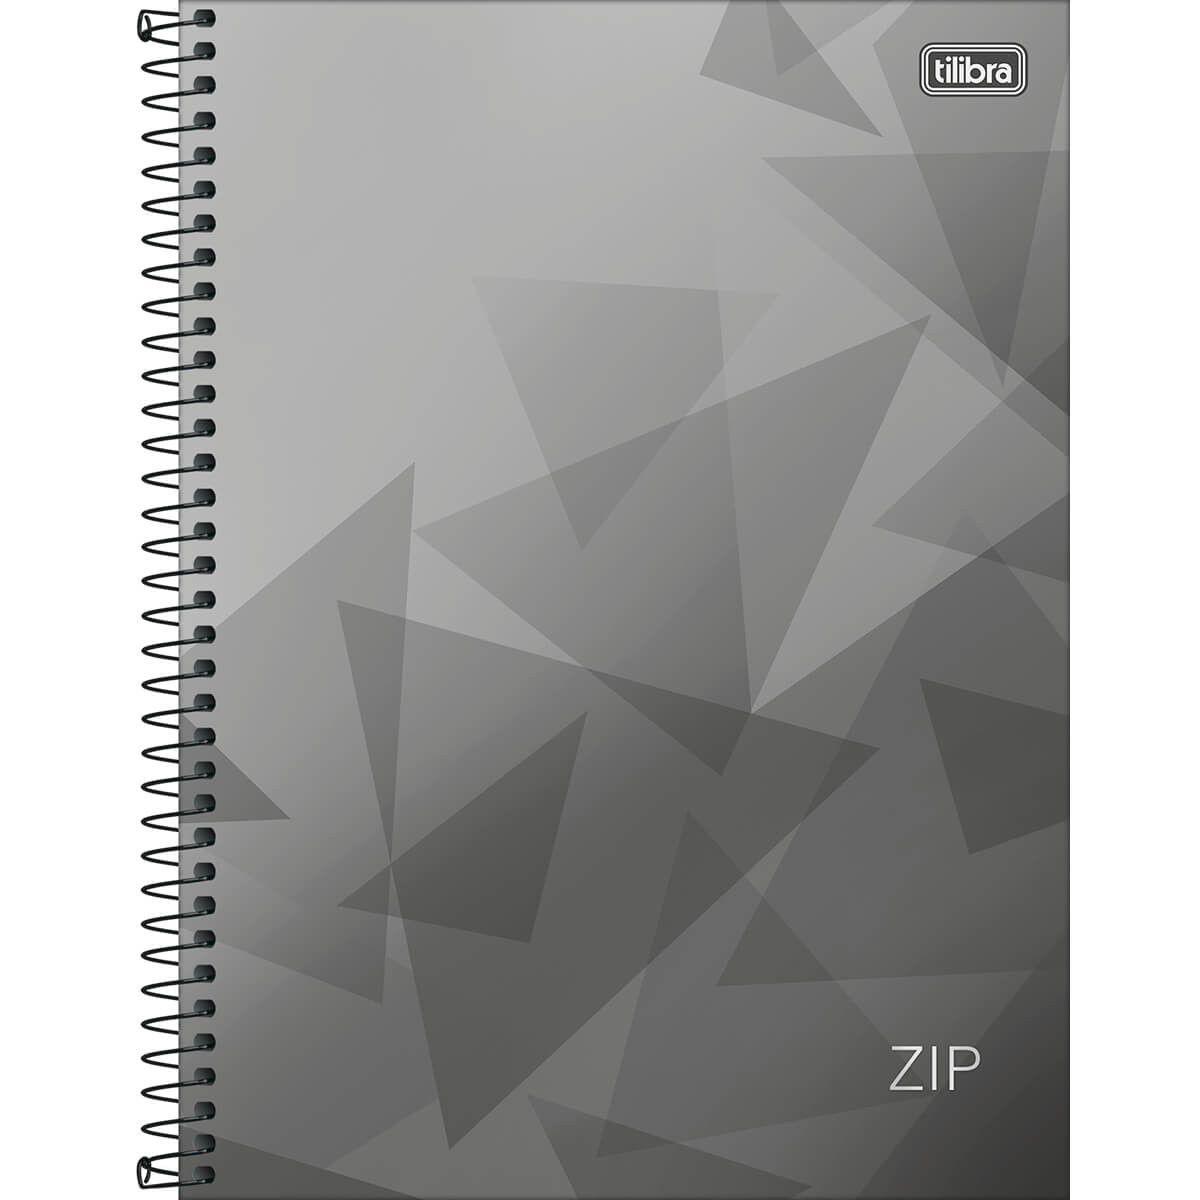 Caderno Tilibra Capa Dura Universitário 1M 96 Fls Zip 134490 27786